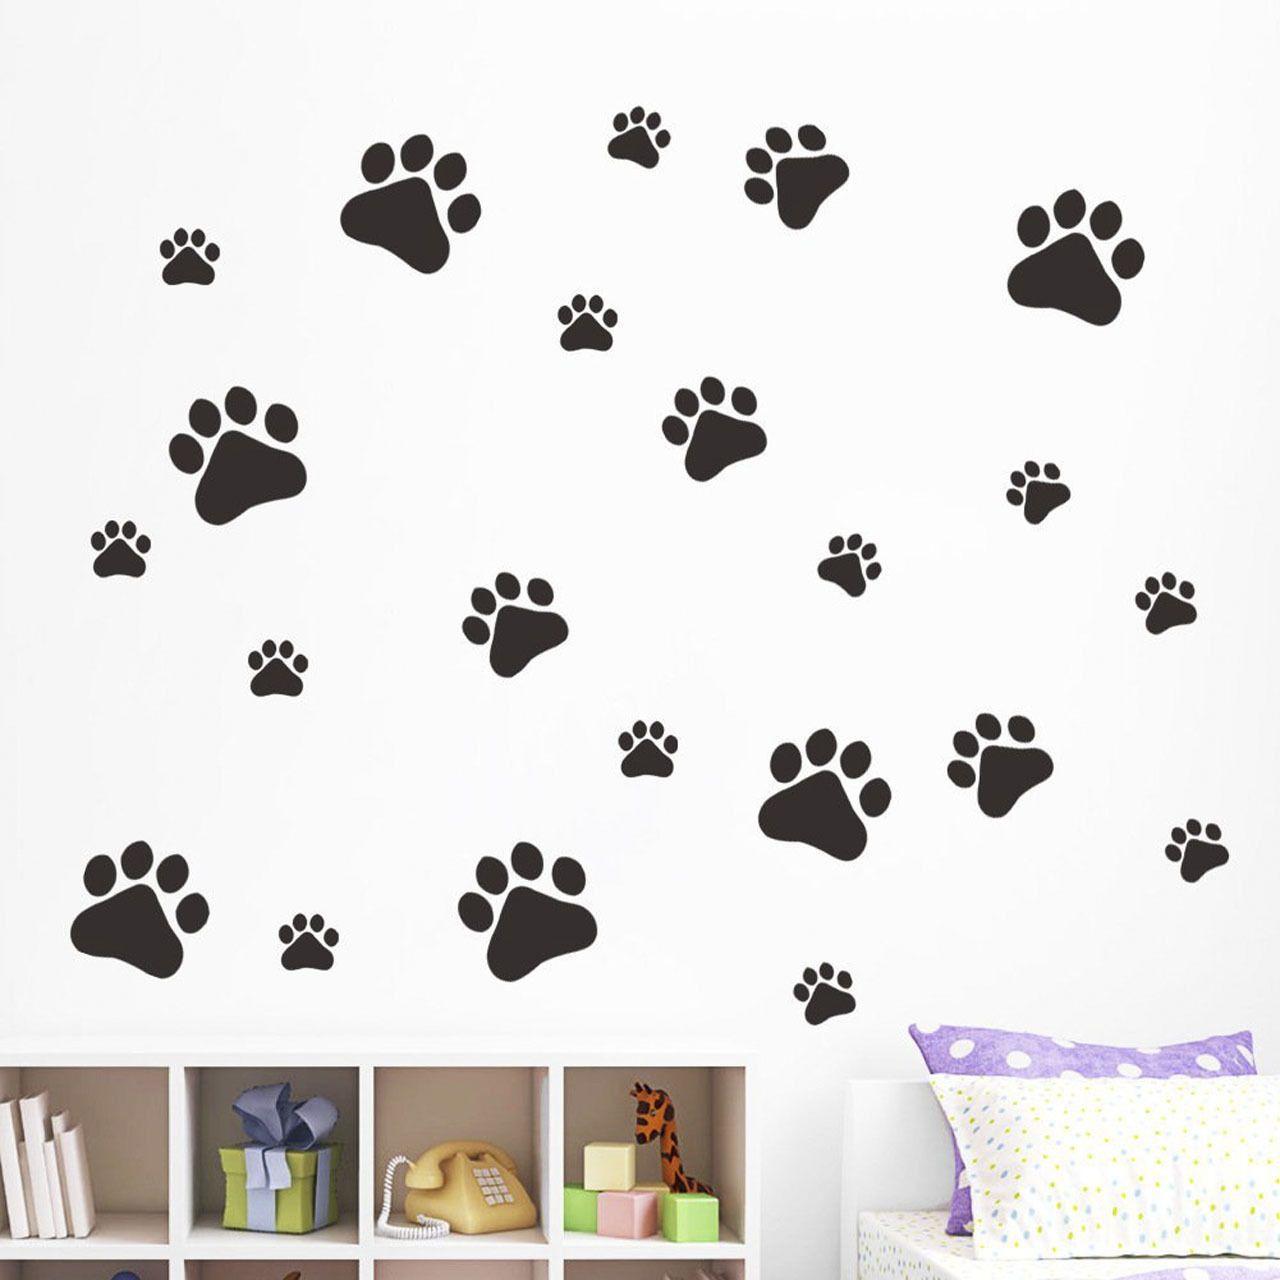 4 56 Black 22 Dog Cat Paw Print Decors Car Wall Sticker Home Wheelie Bin Decal Ebay Home Garden Kids Room Decals Wall Stickers Home Sticker Decor [ 1280 x 1280 Pixel ]